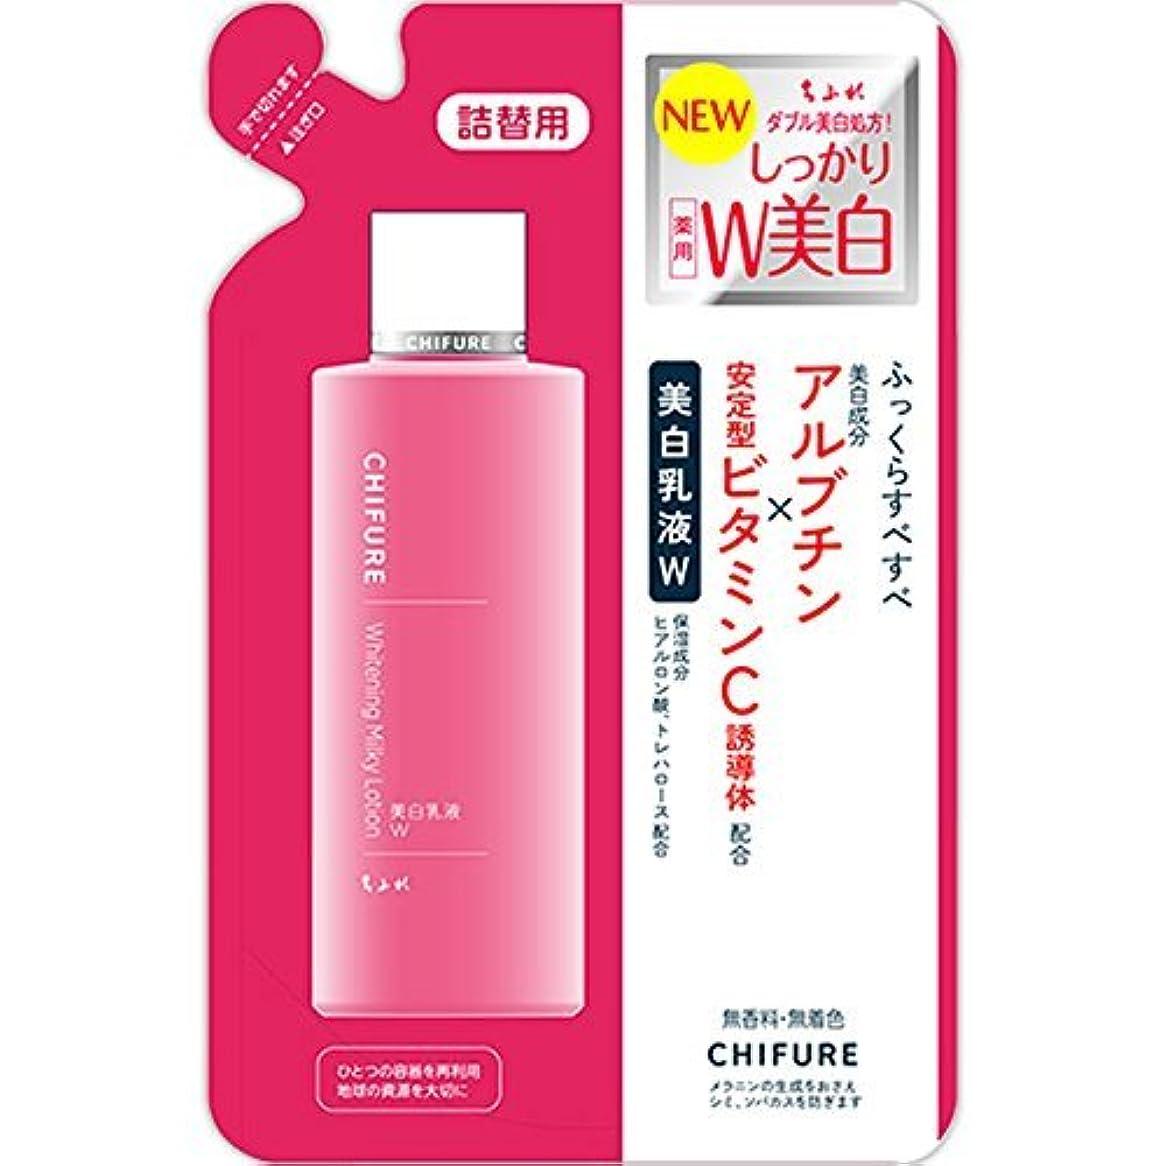 裁量繊維縞模様のちふれ化粧品 美白乳液 W 詰替 150ML (医薬部外品)